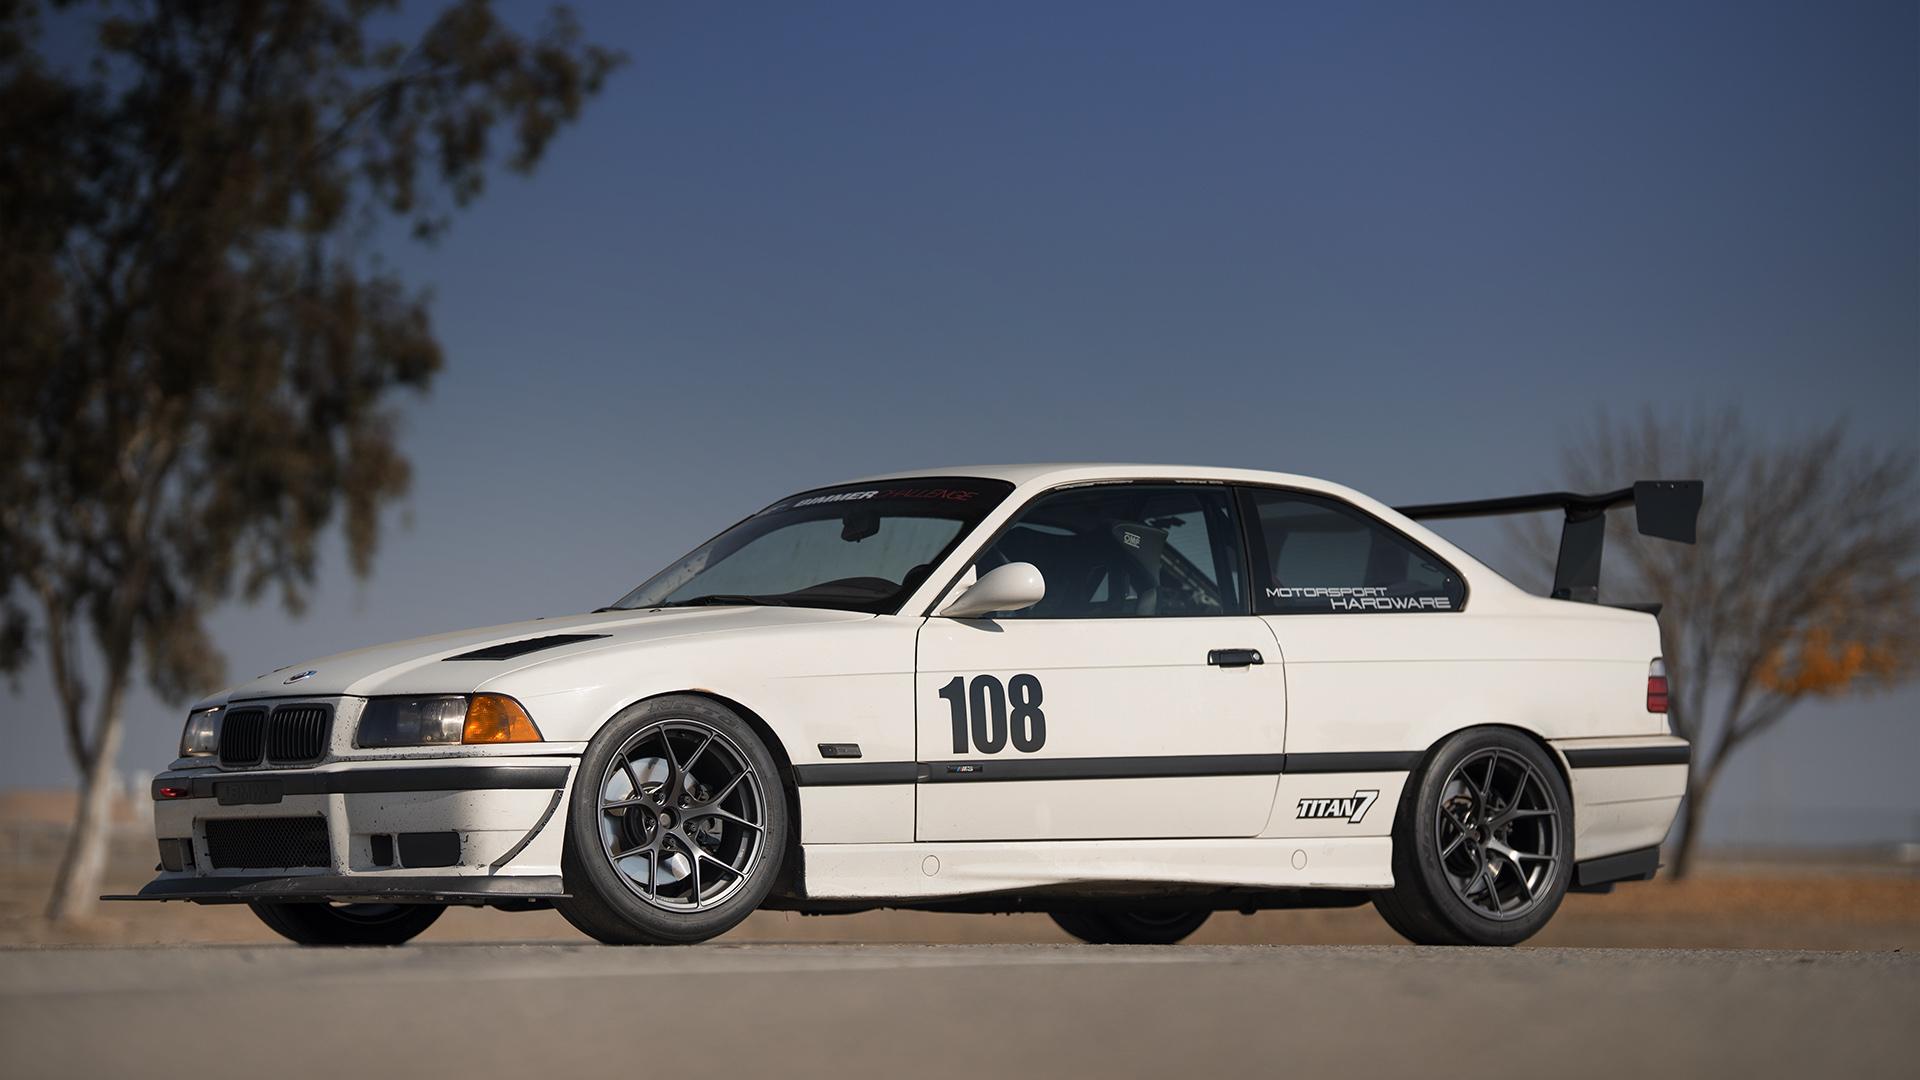 Inner Front Lemfoerder Ball Joint 3 Series For BMW 325i E90 325is E36 M3 E93//M